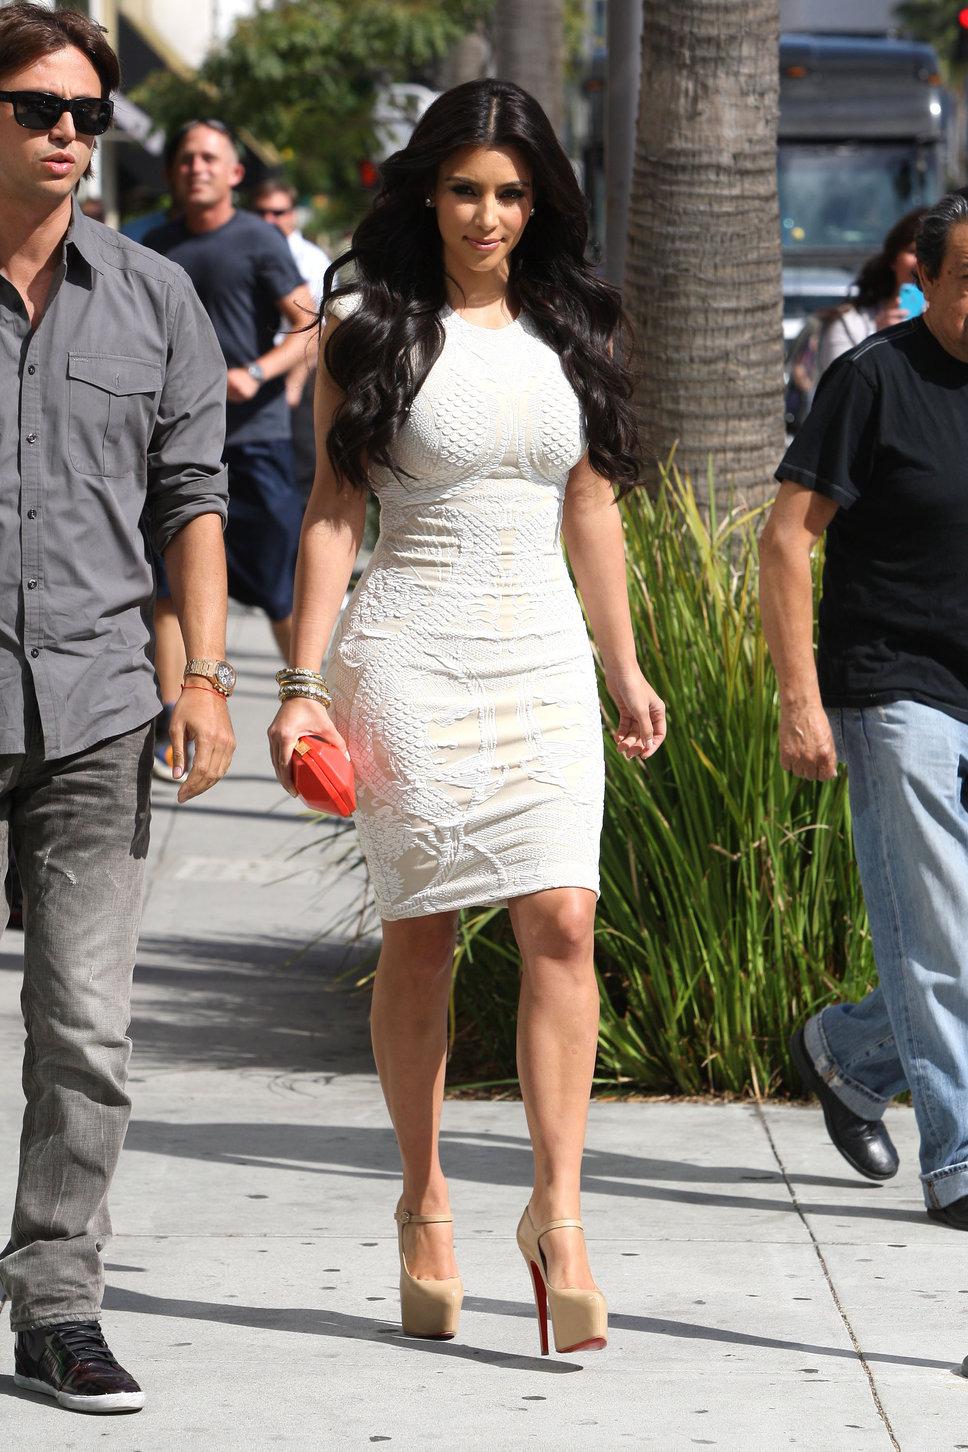 dresses Kim kardashian in white